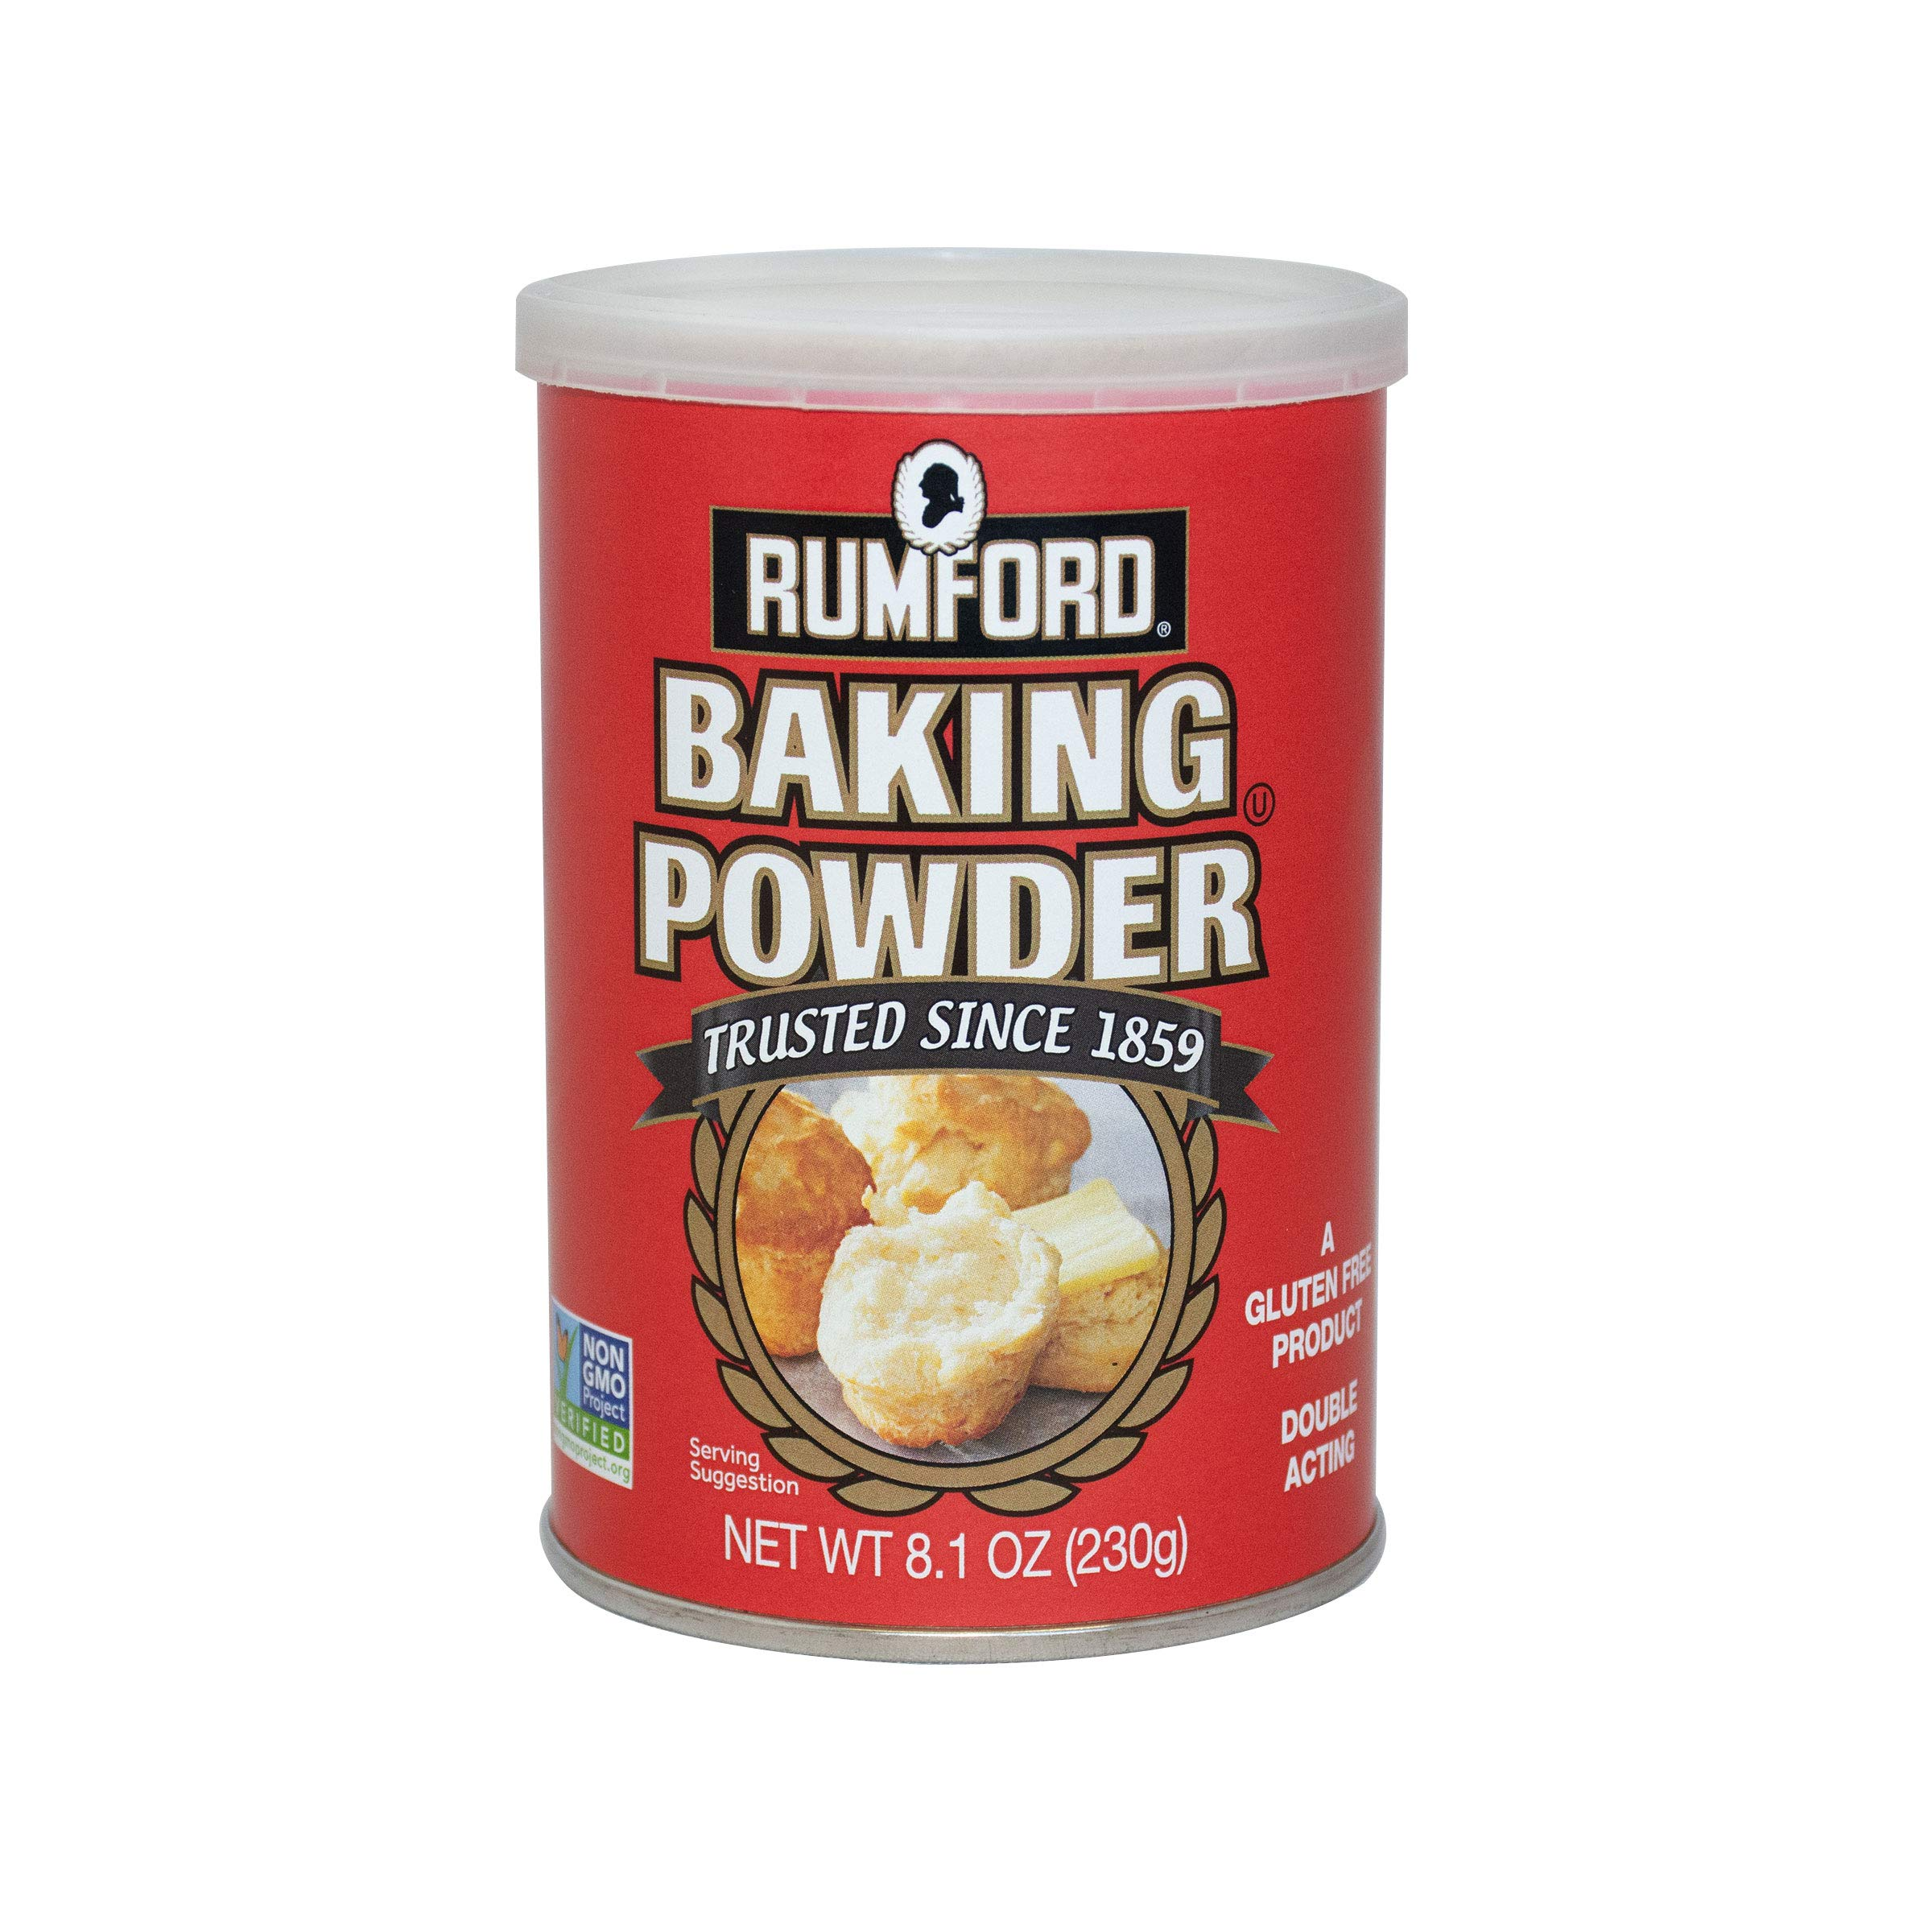 Rumford Baking Powder, 8.1 Ounce